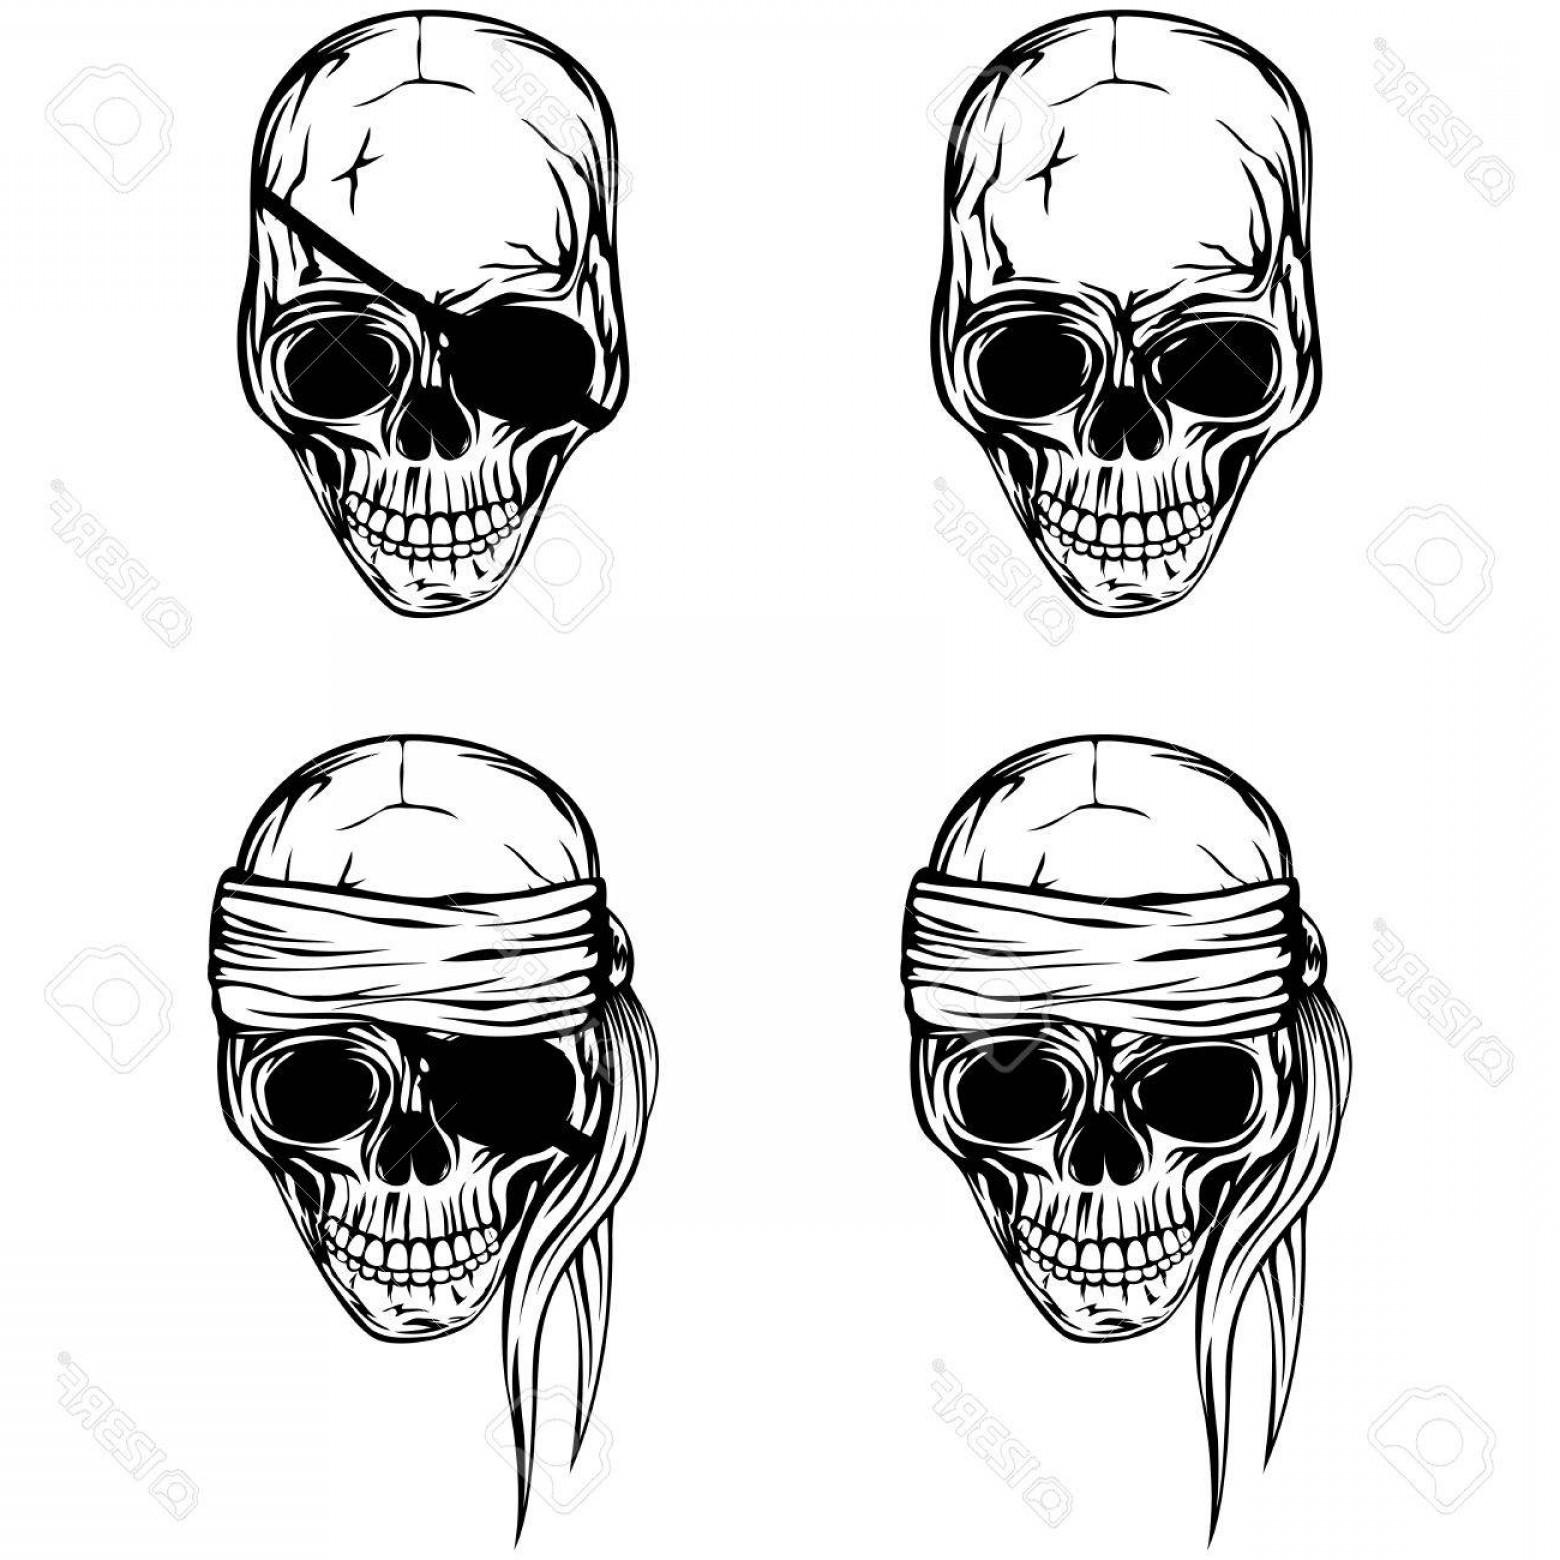 1560x1560 Photostock Vector Vector Illustration Pirate Skull Set Skull With